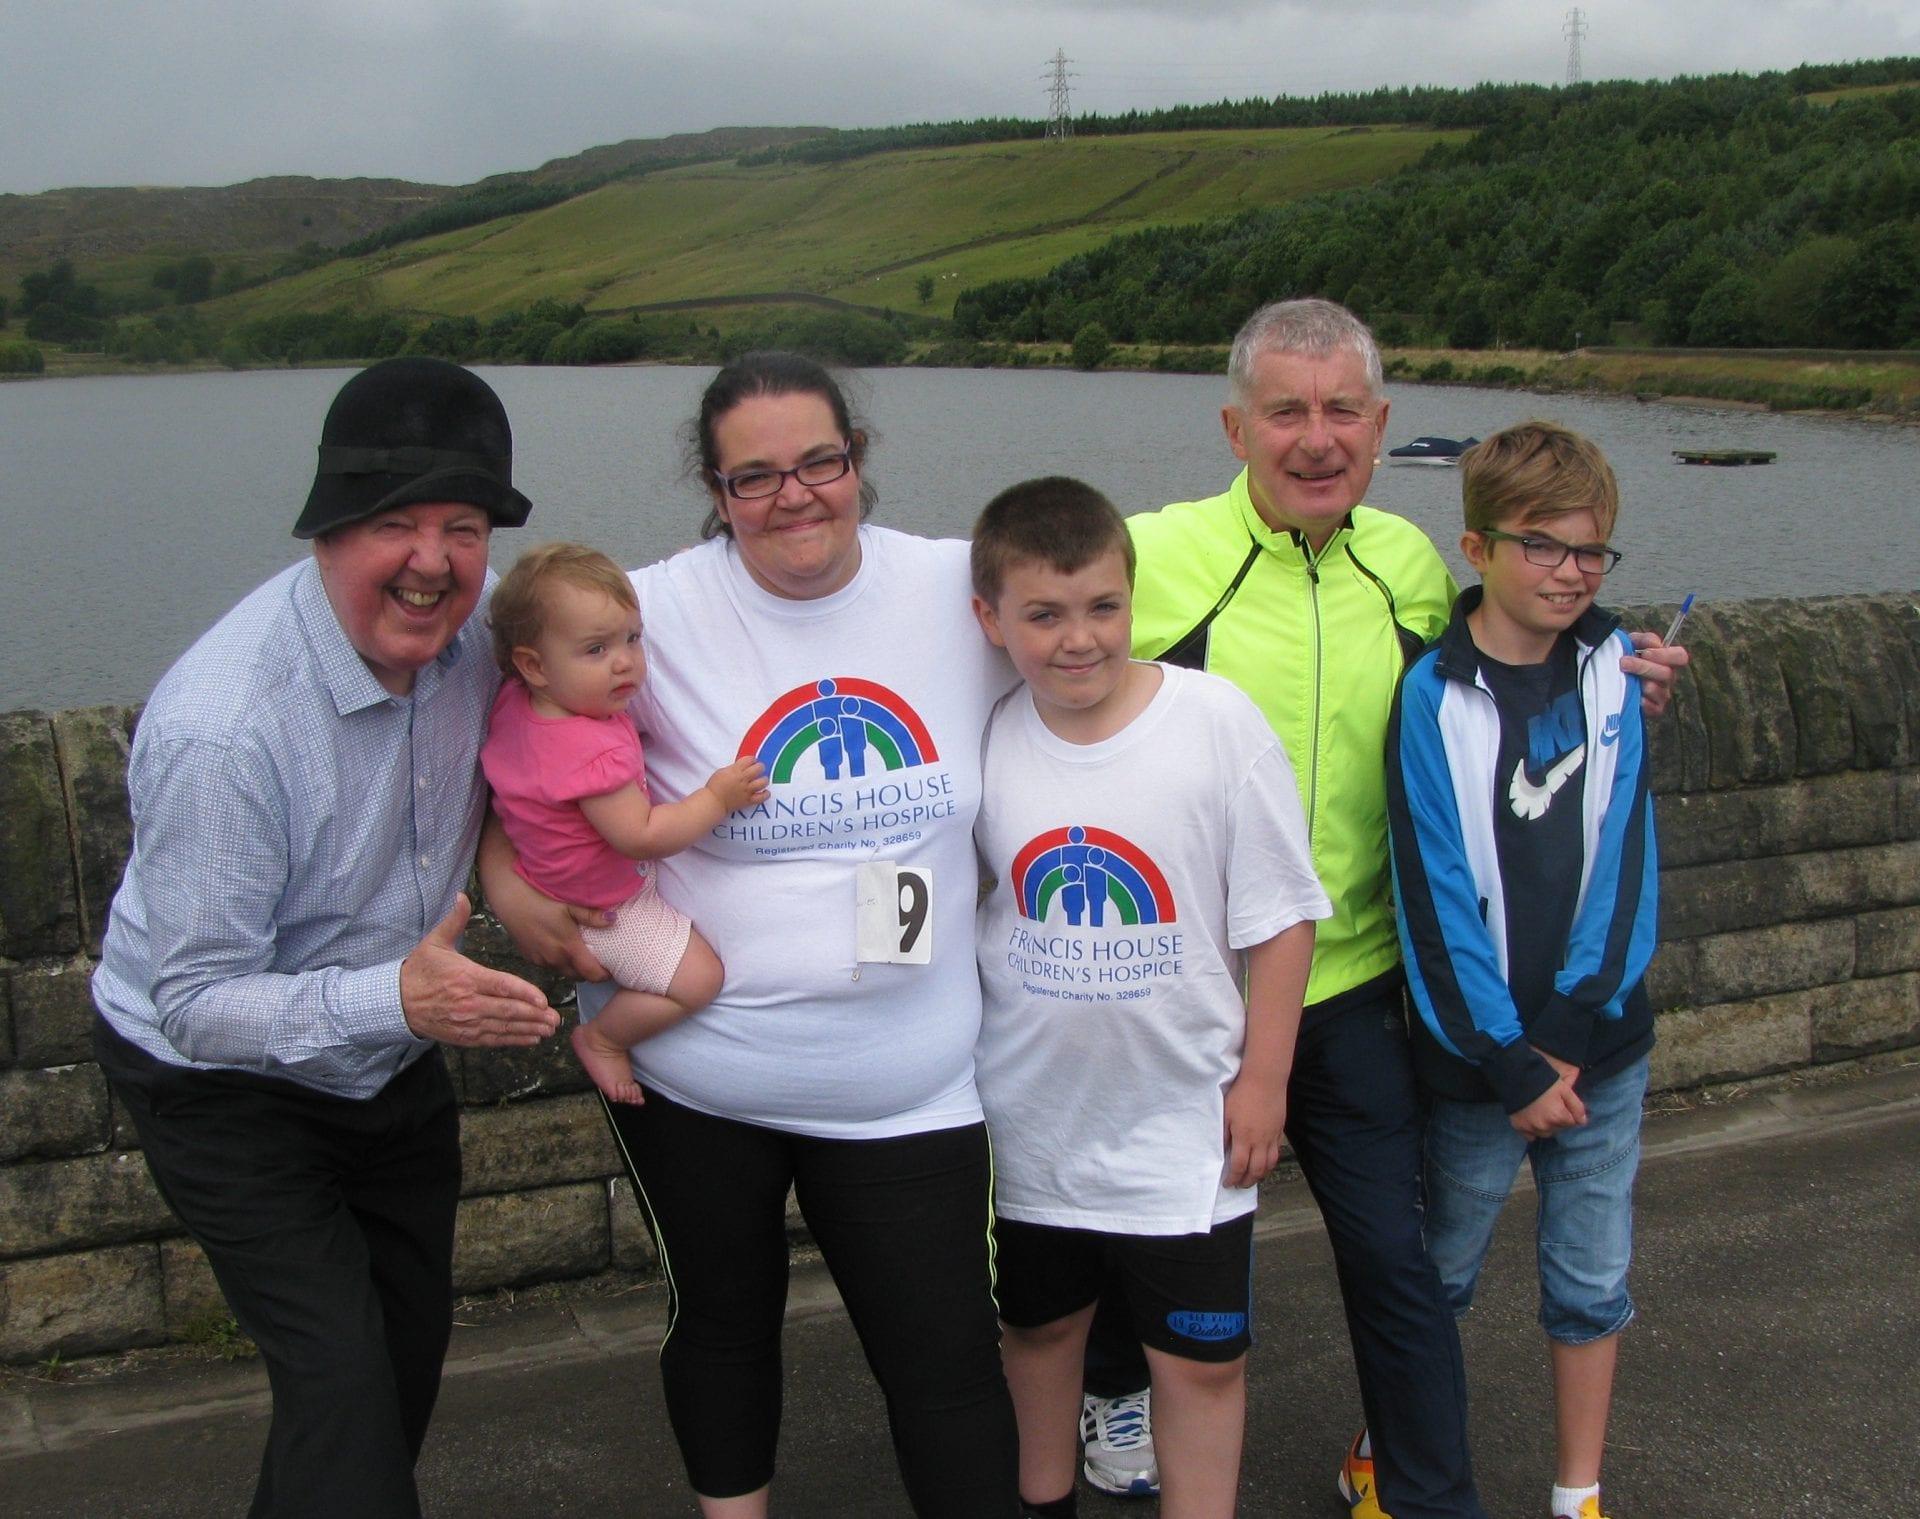 Jimmy Cricket with race organiser Andy O'Sullivan, runner Jo Davies, her two children - Lucas Davies and Lillie Mai Davies - and Daniel Barker at the scene of the fun run near Cowm Reservoir